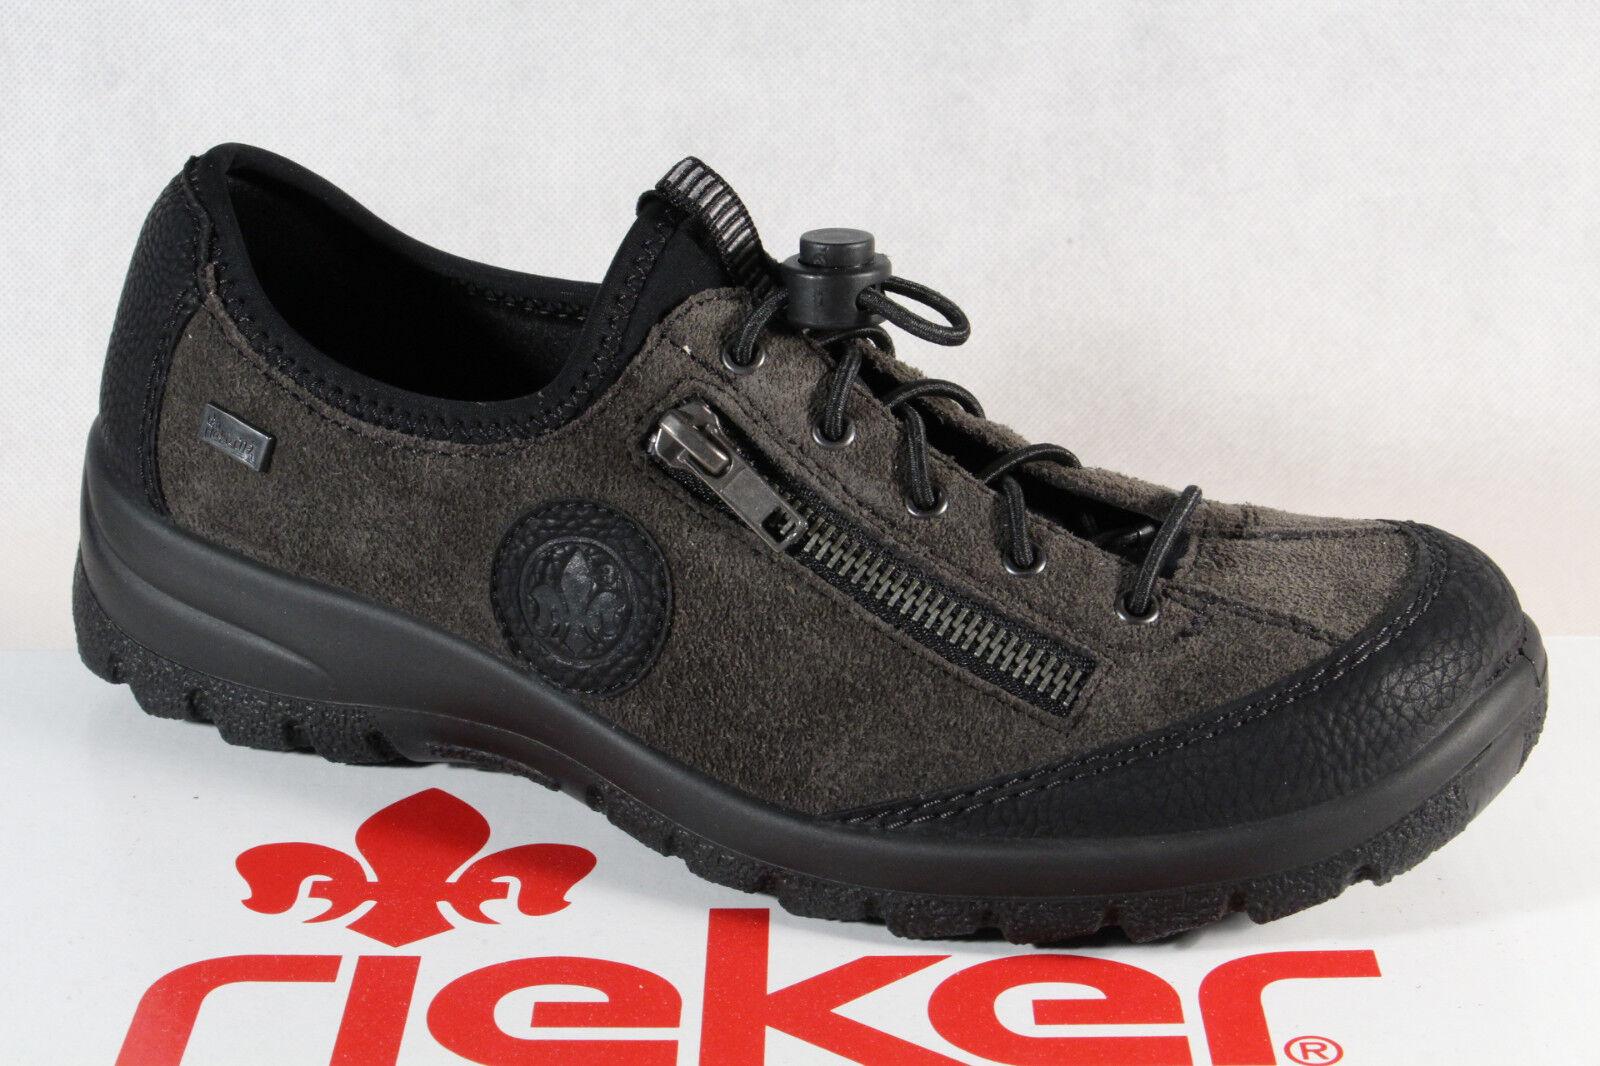 Rieker Damen Slipper Halbschuhe Sneaker Leder Neu!!!